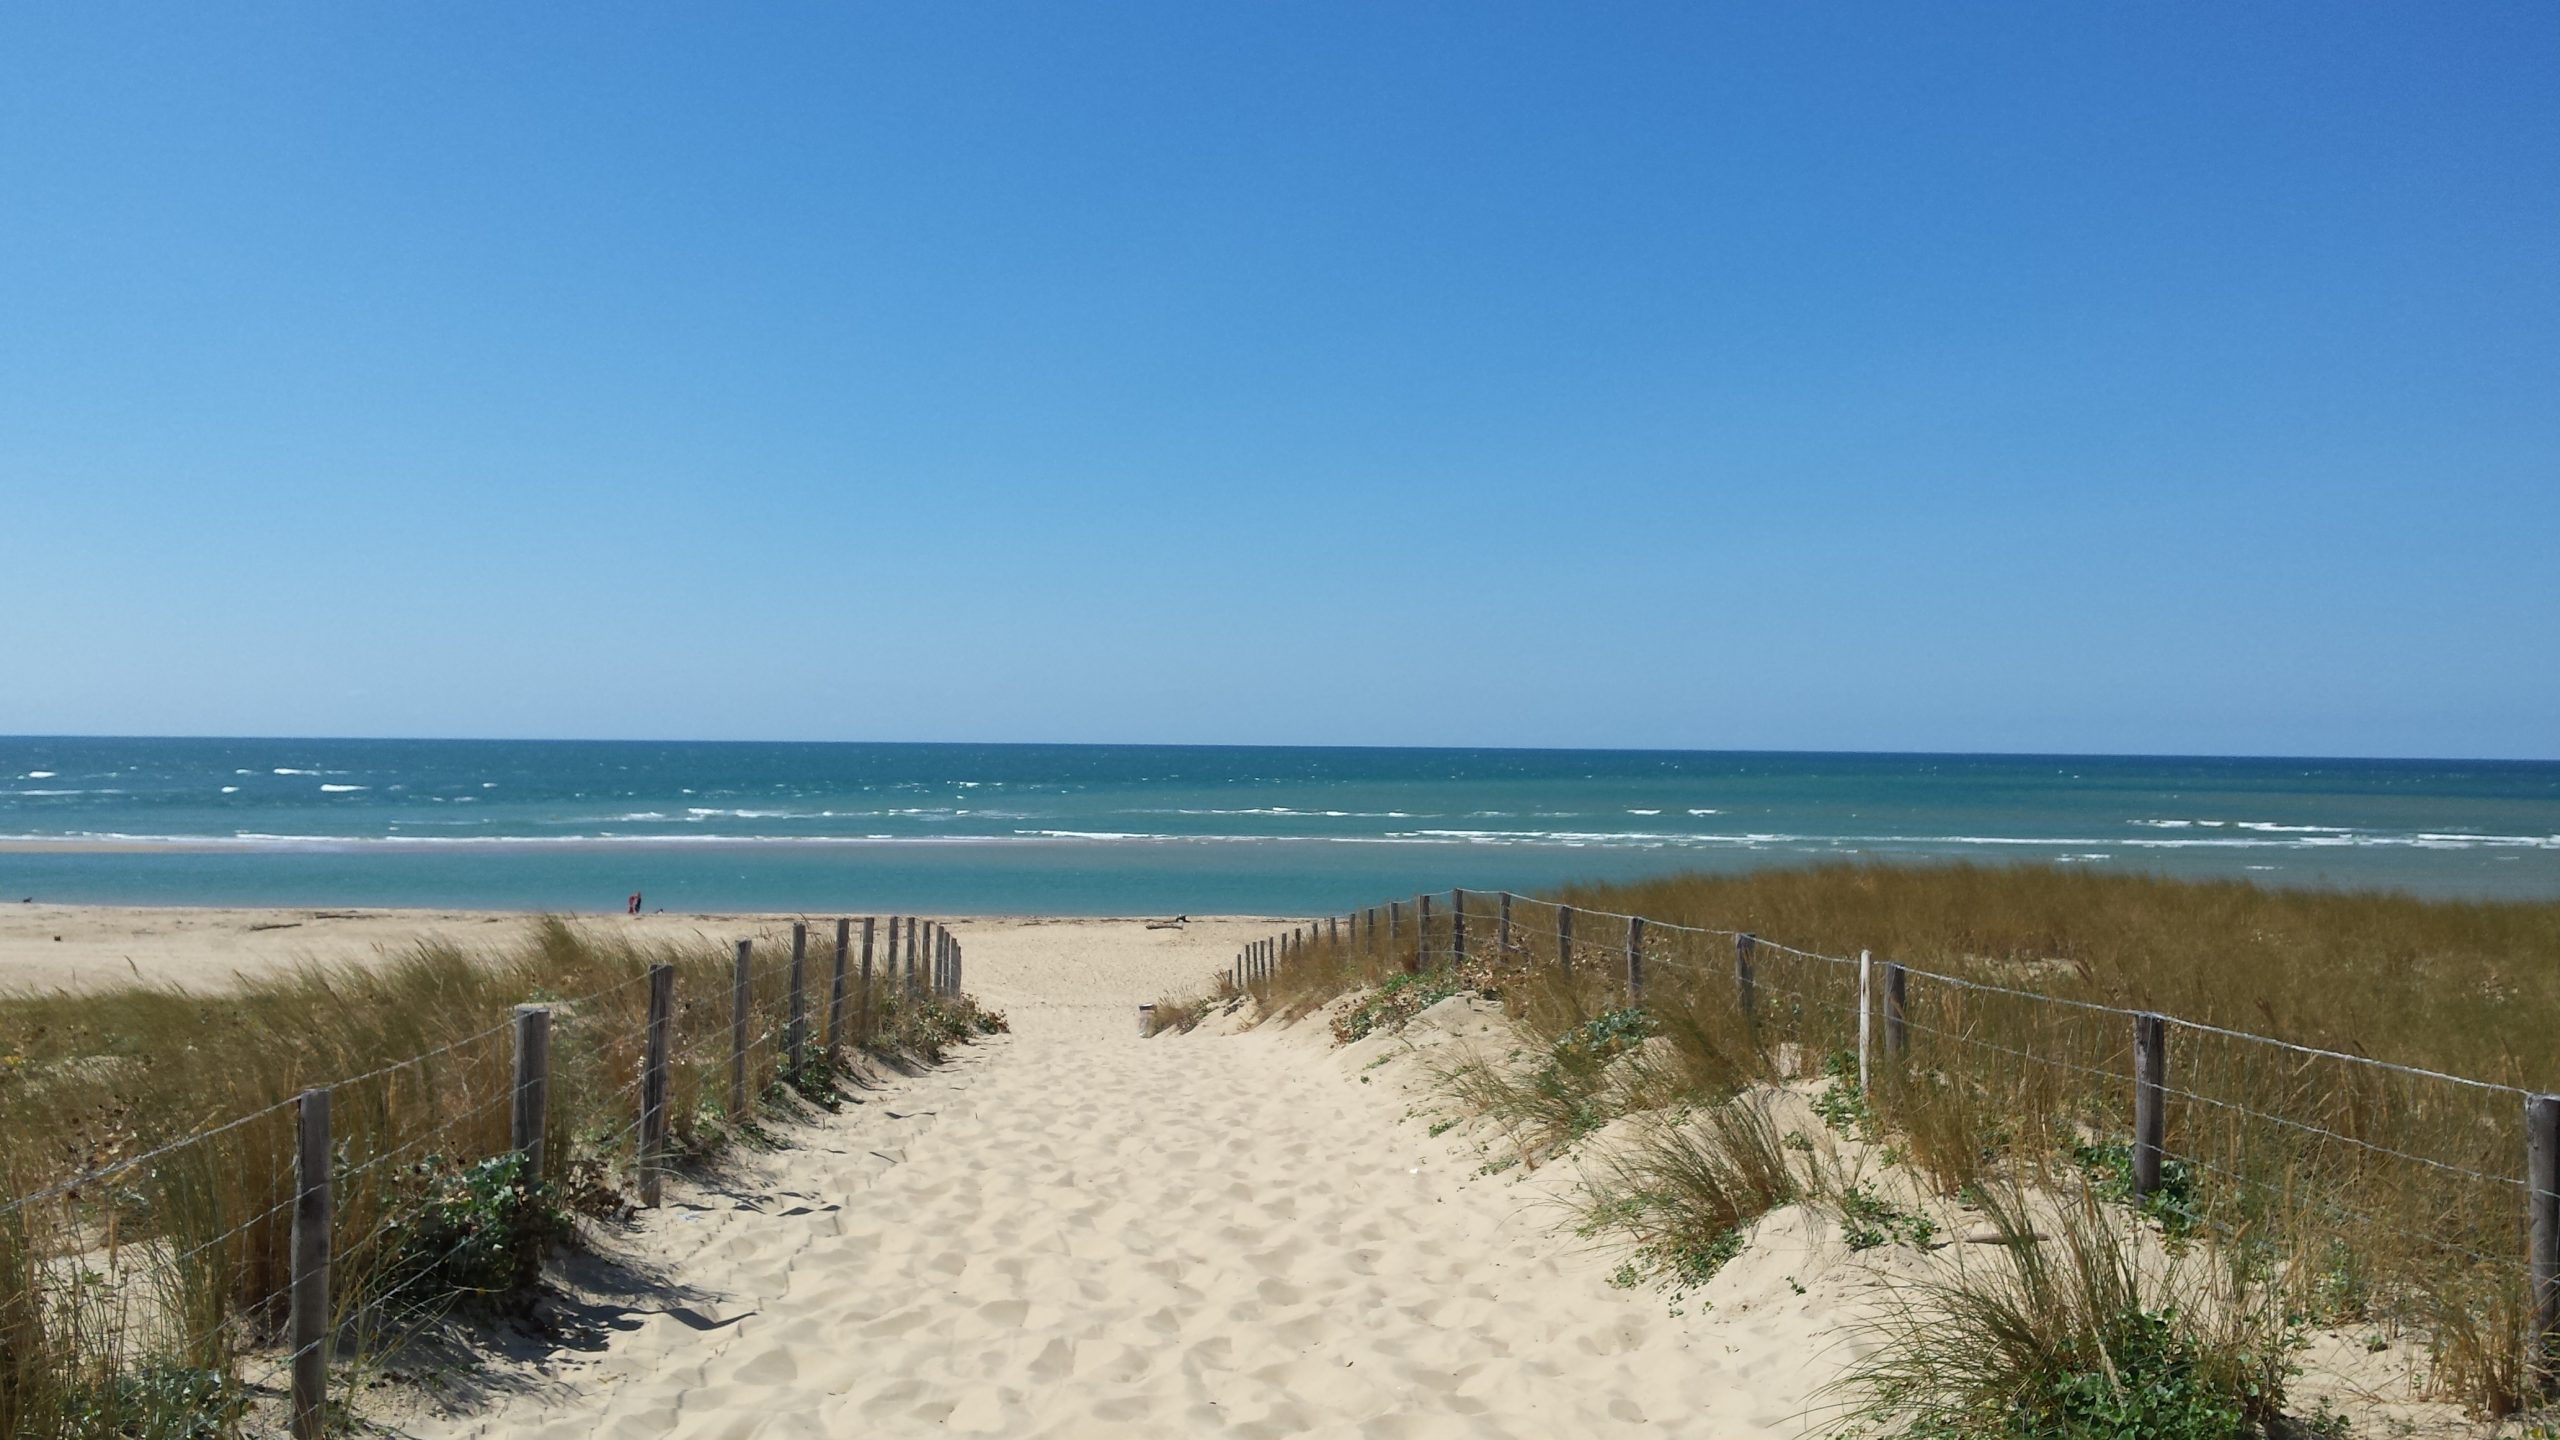 mer océan plage soleil surf kite paddle jetski surveillance